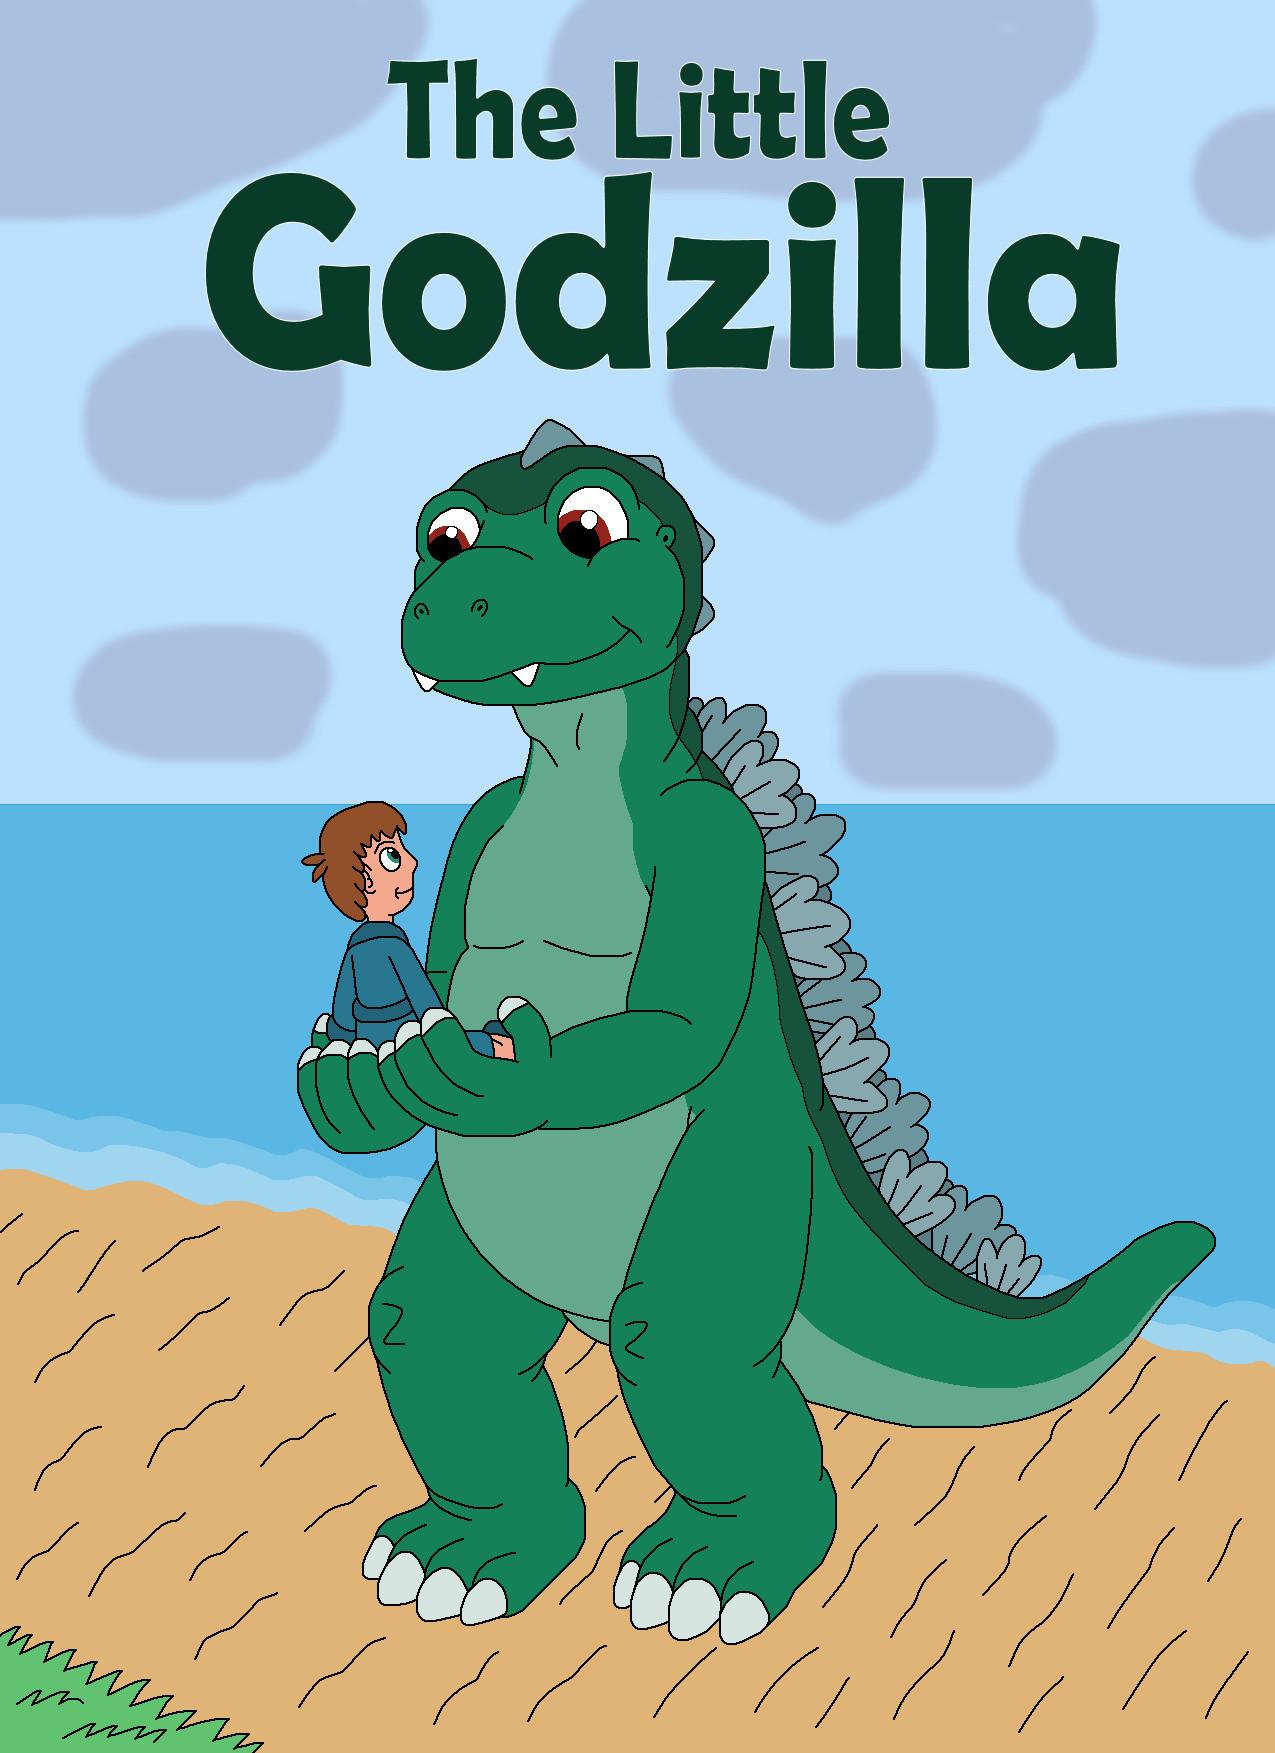 The Little Godzilla by MCsaurus